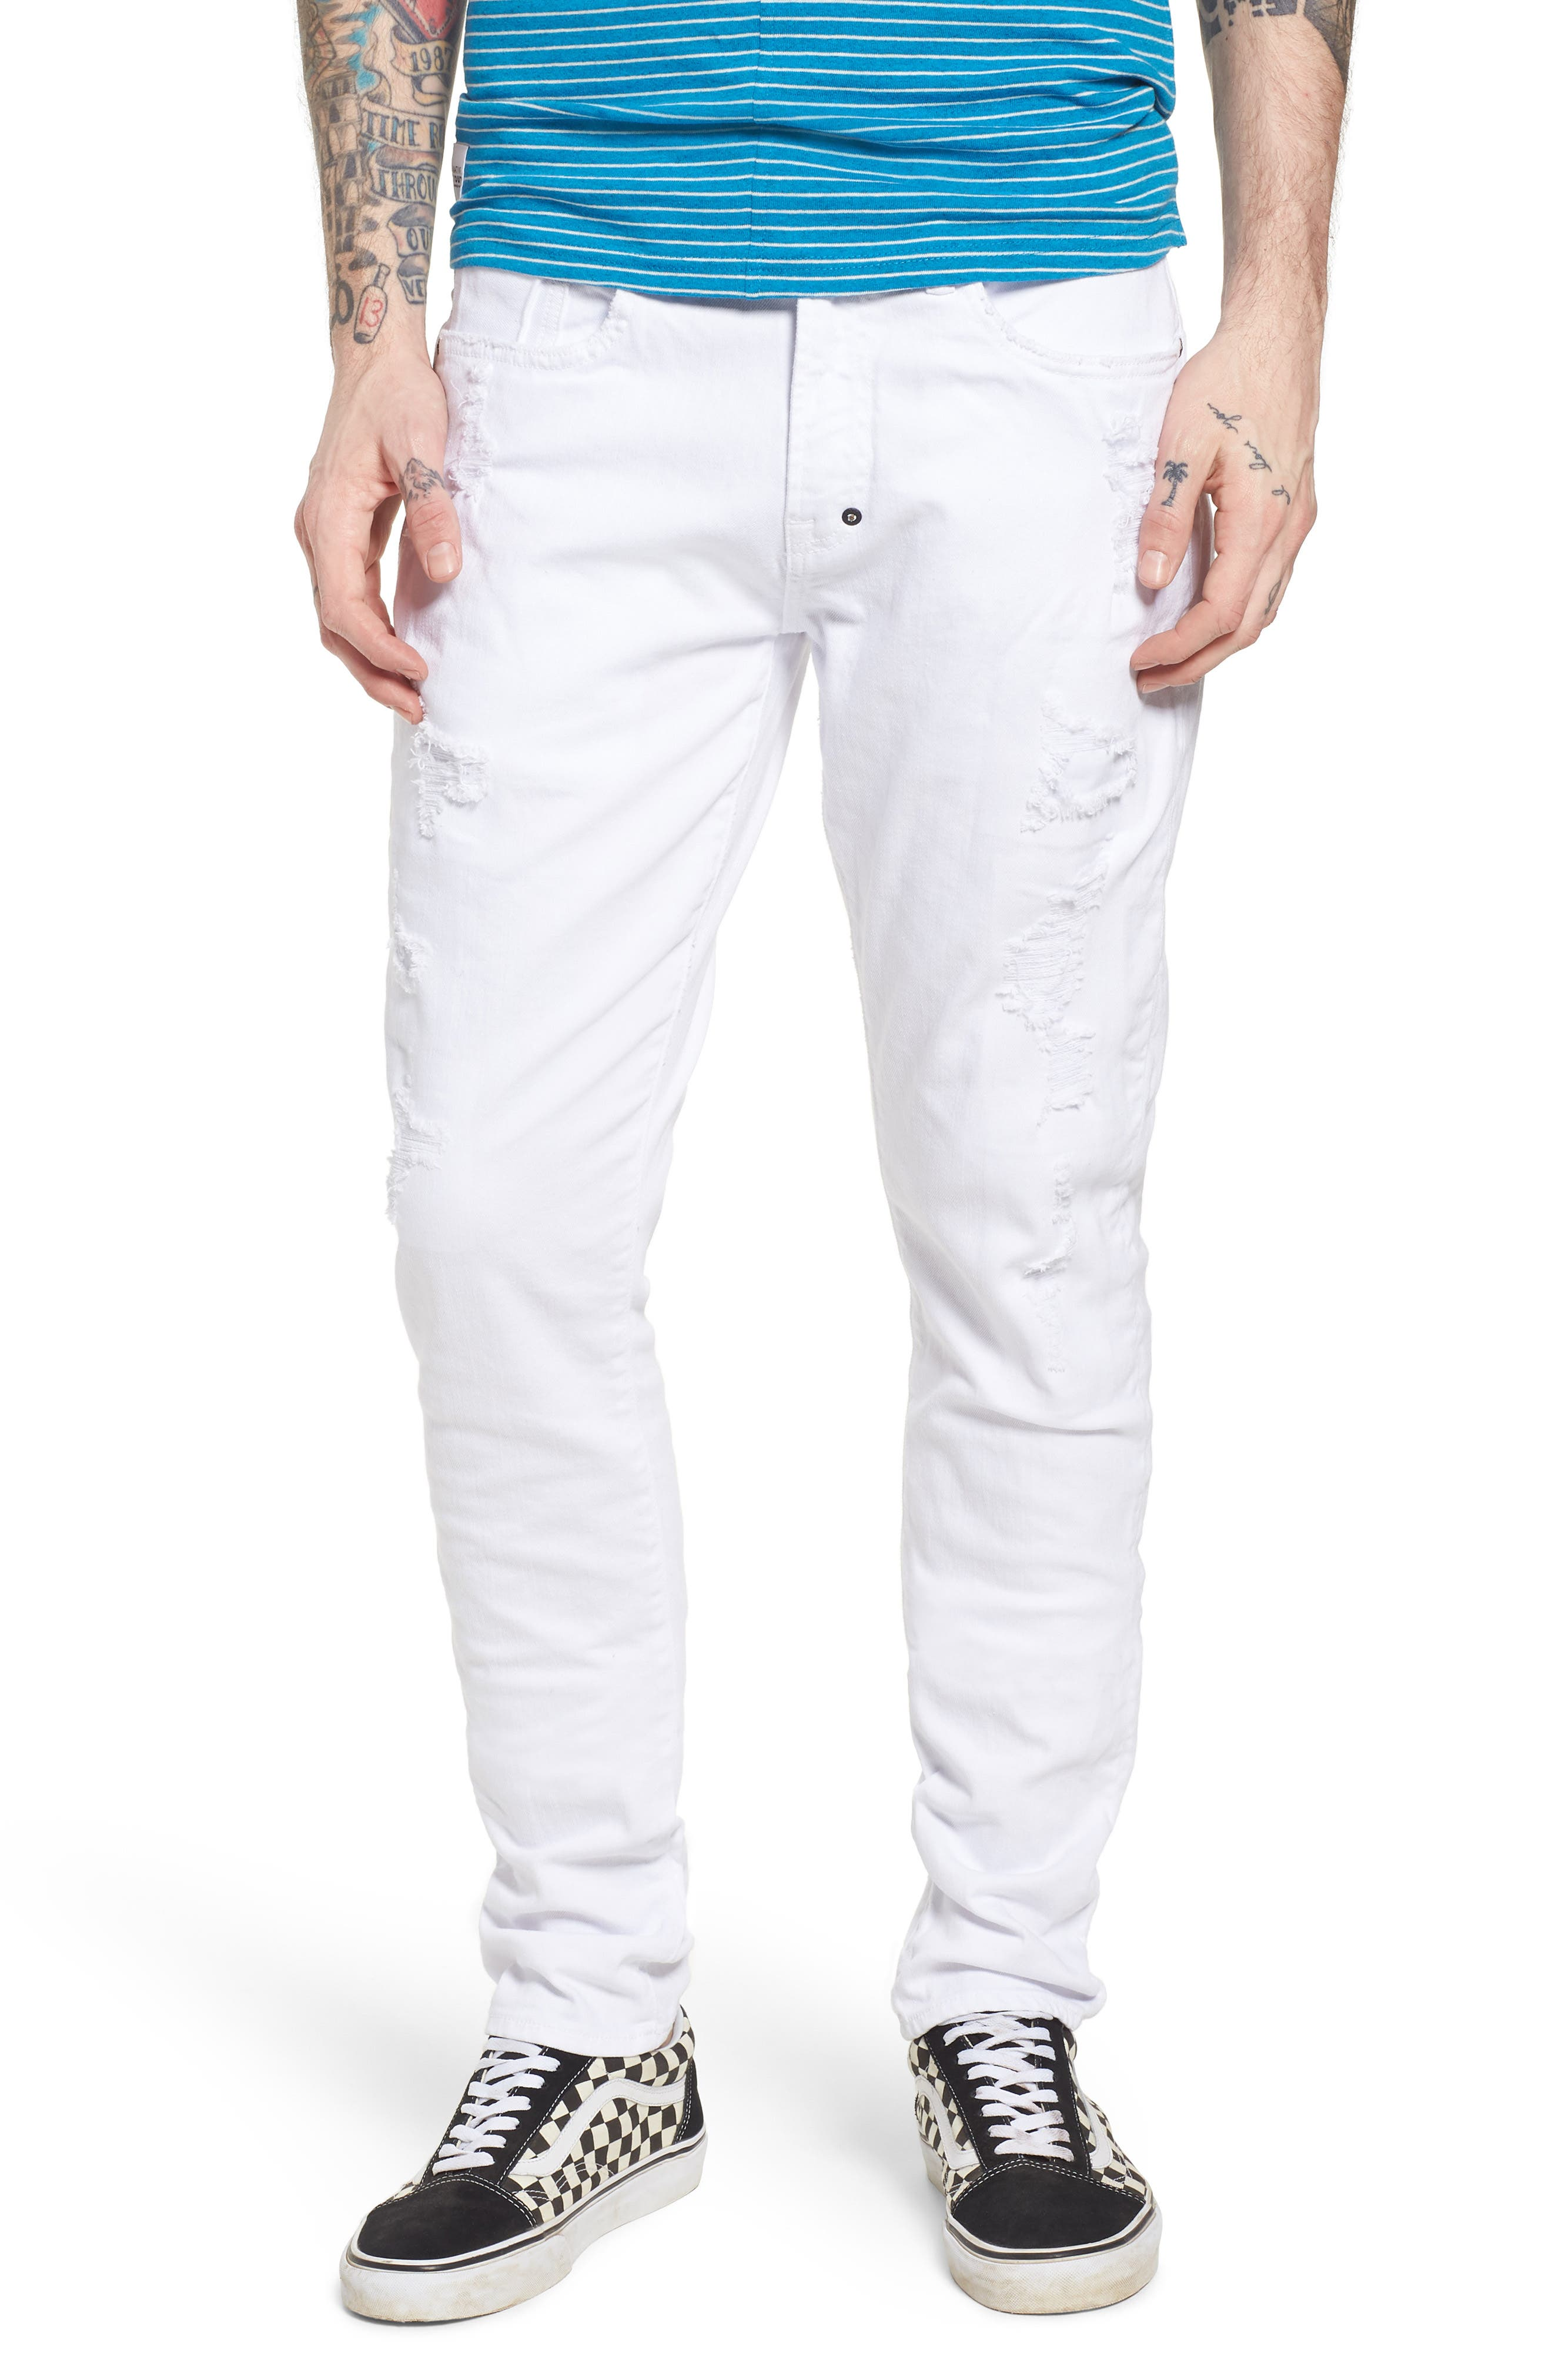 Windsor Slim Fit Jeans,                         Main,                         color, Living White